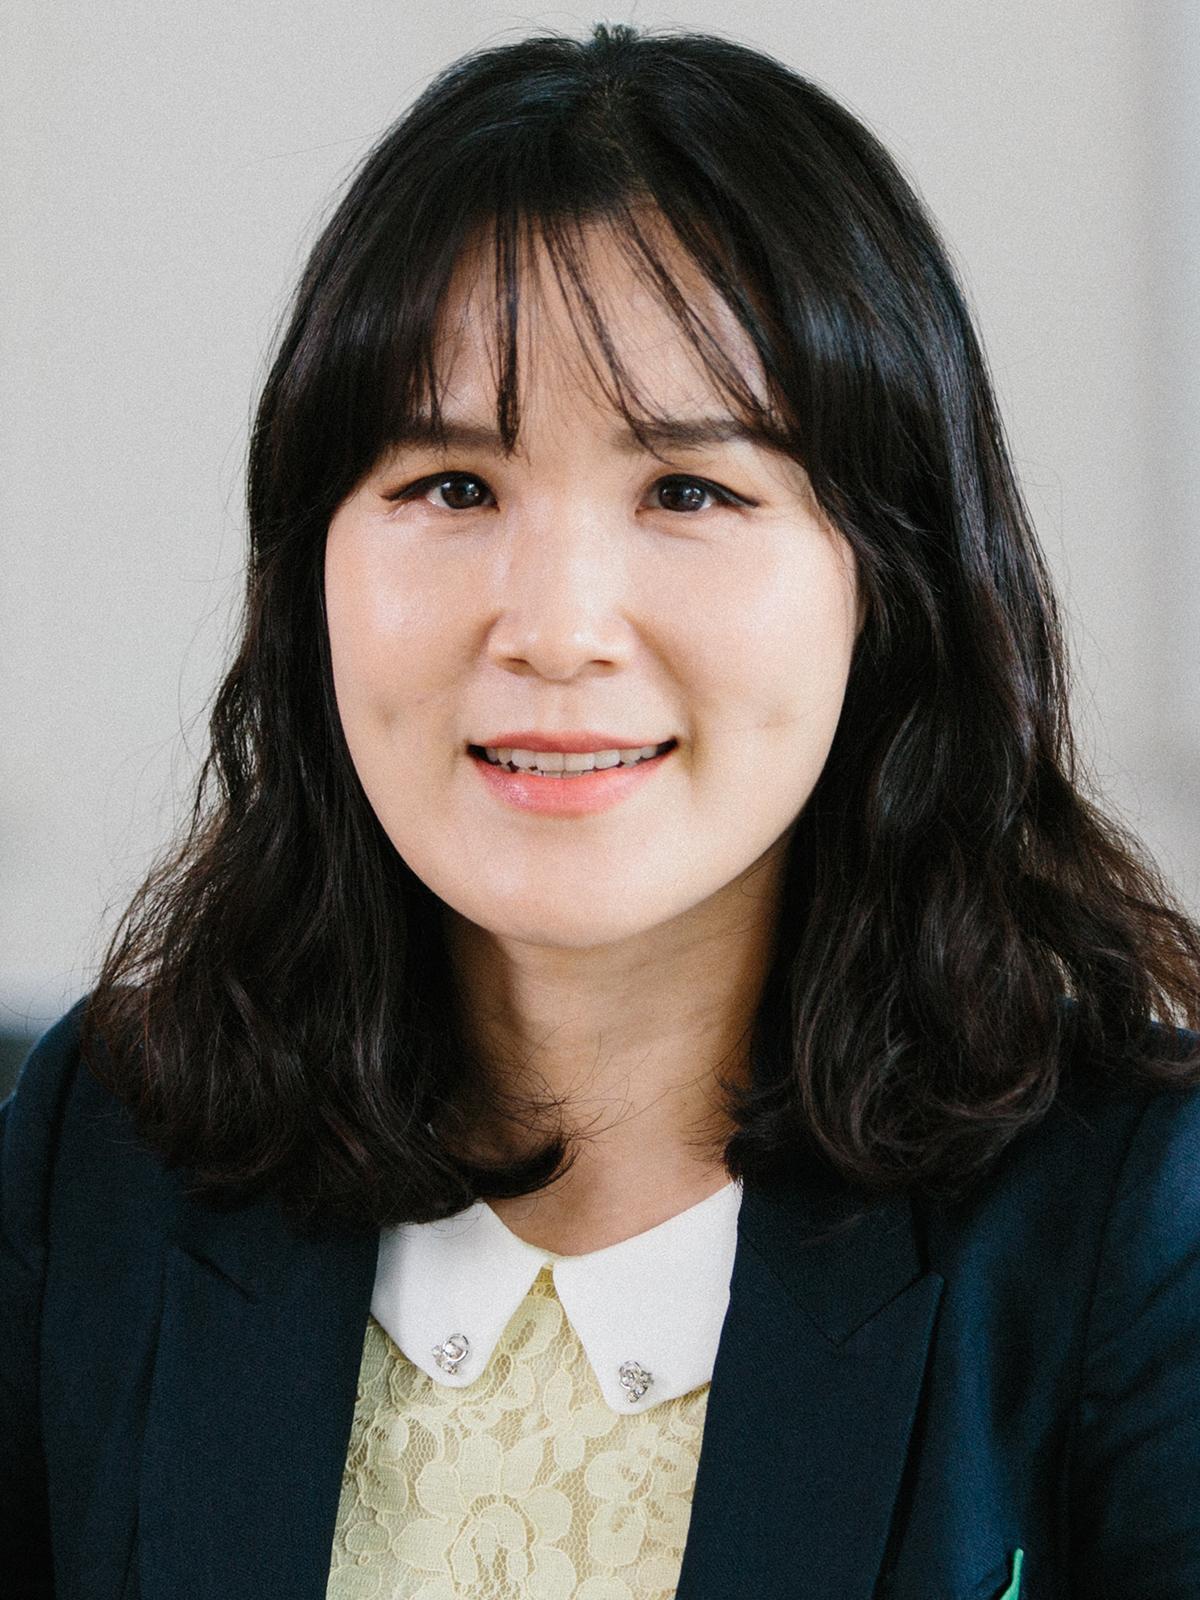 Kelly Ryoo portrait image